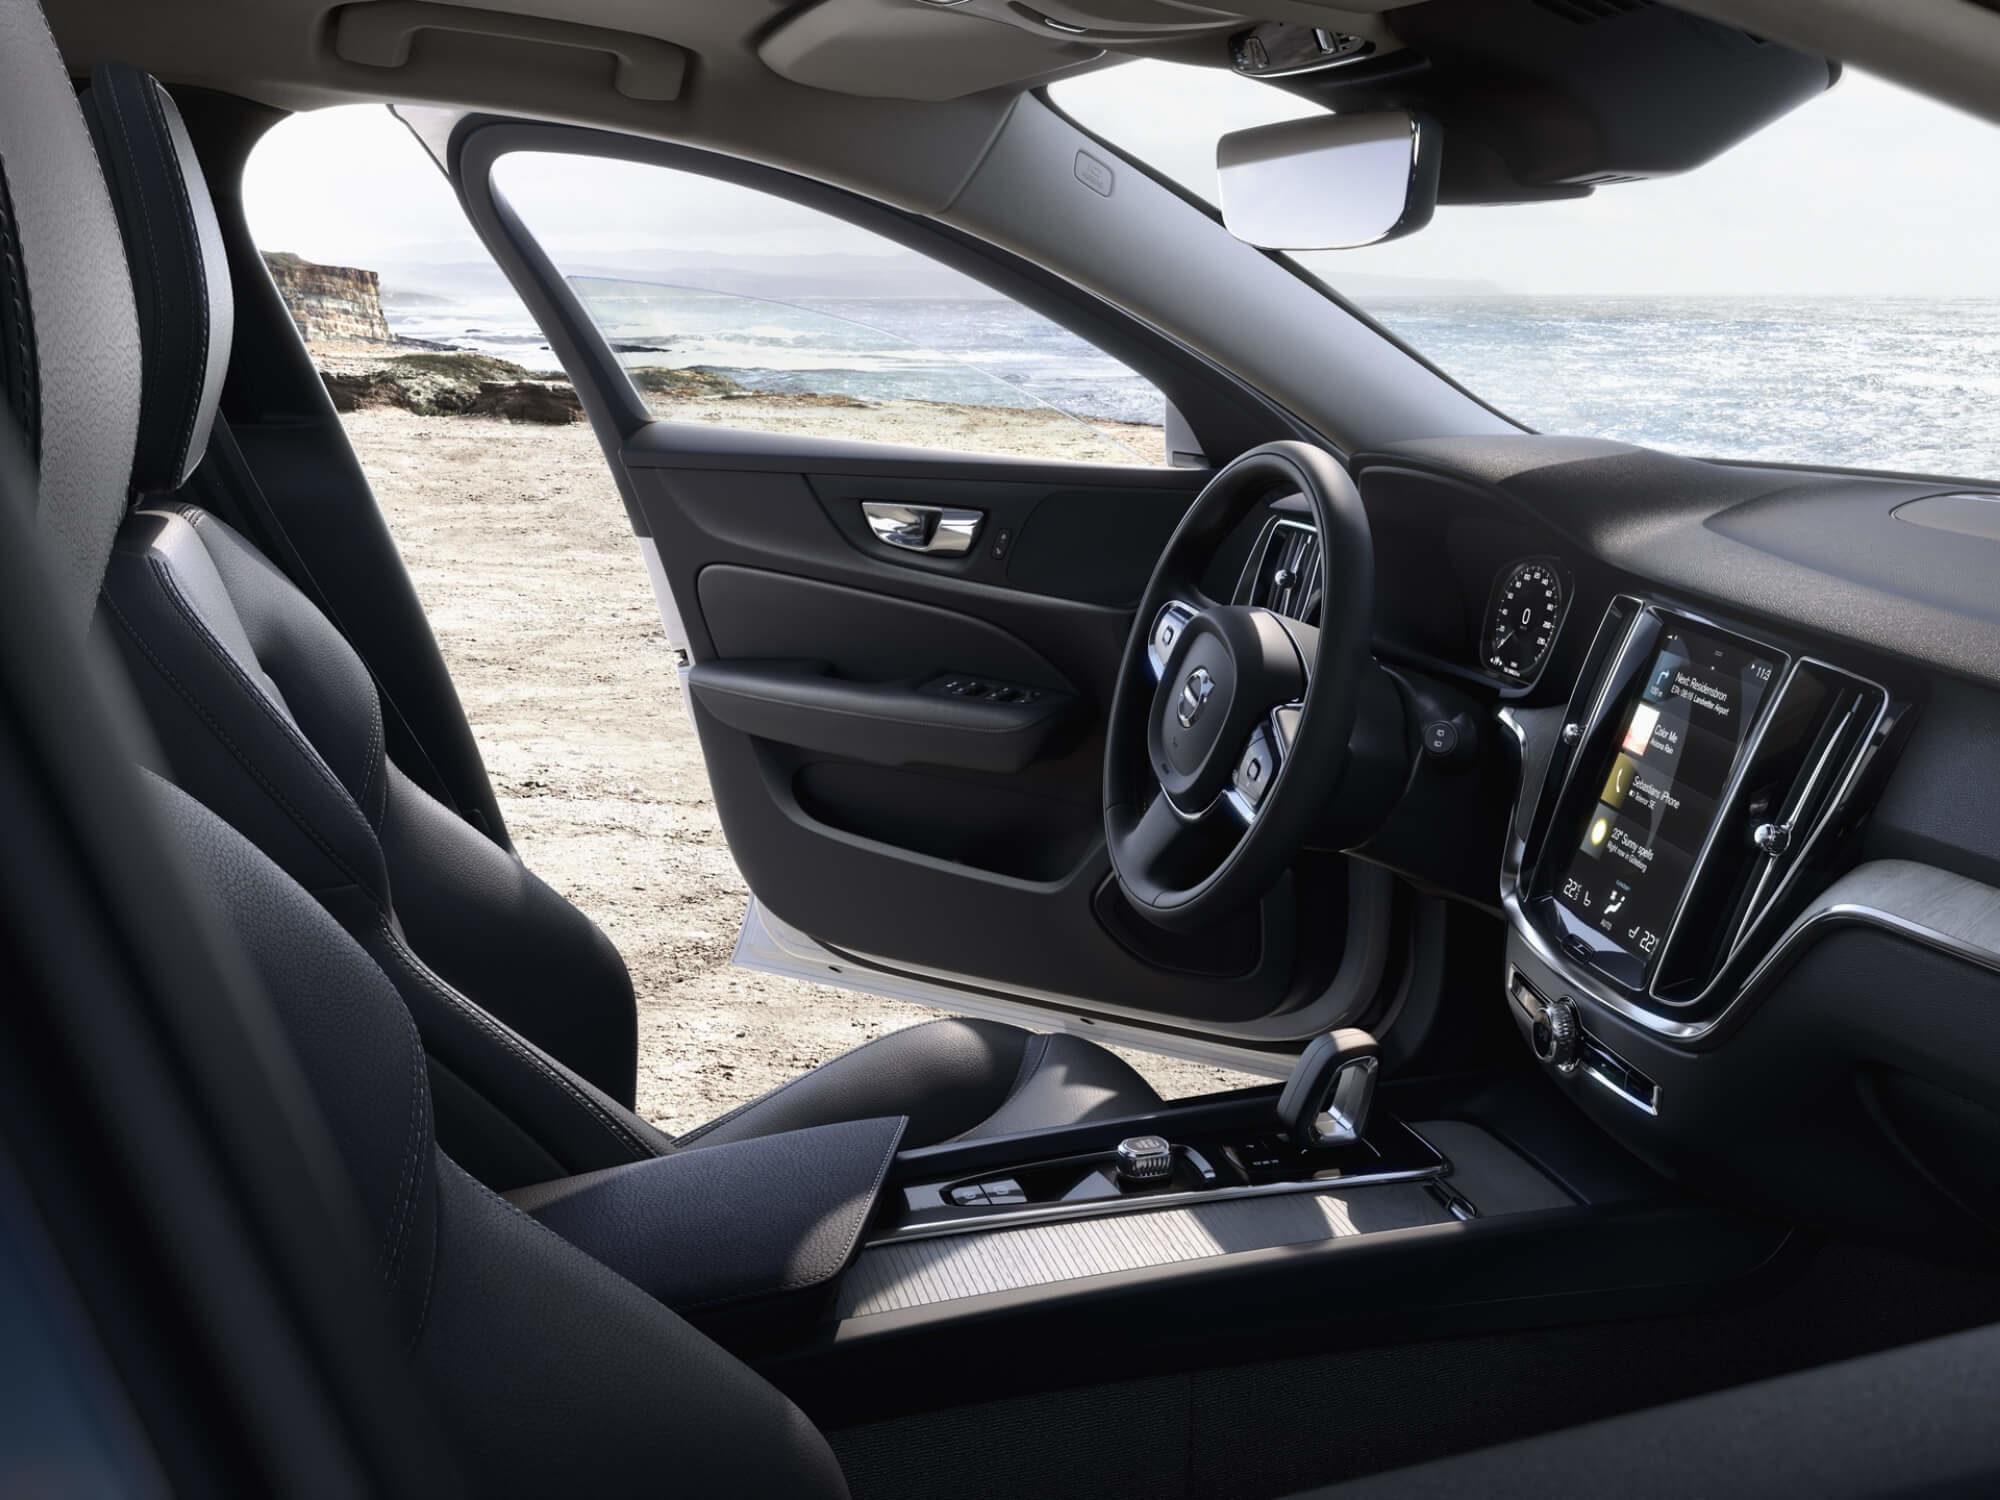 Volvo V60 Cross Country voorstoelen